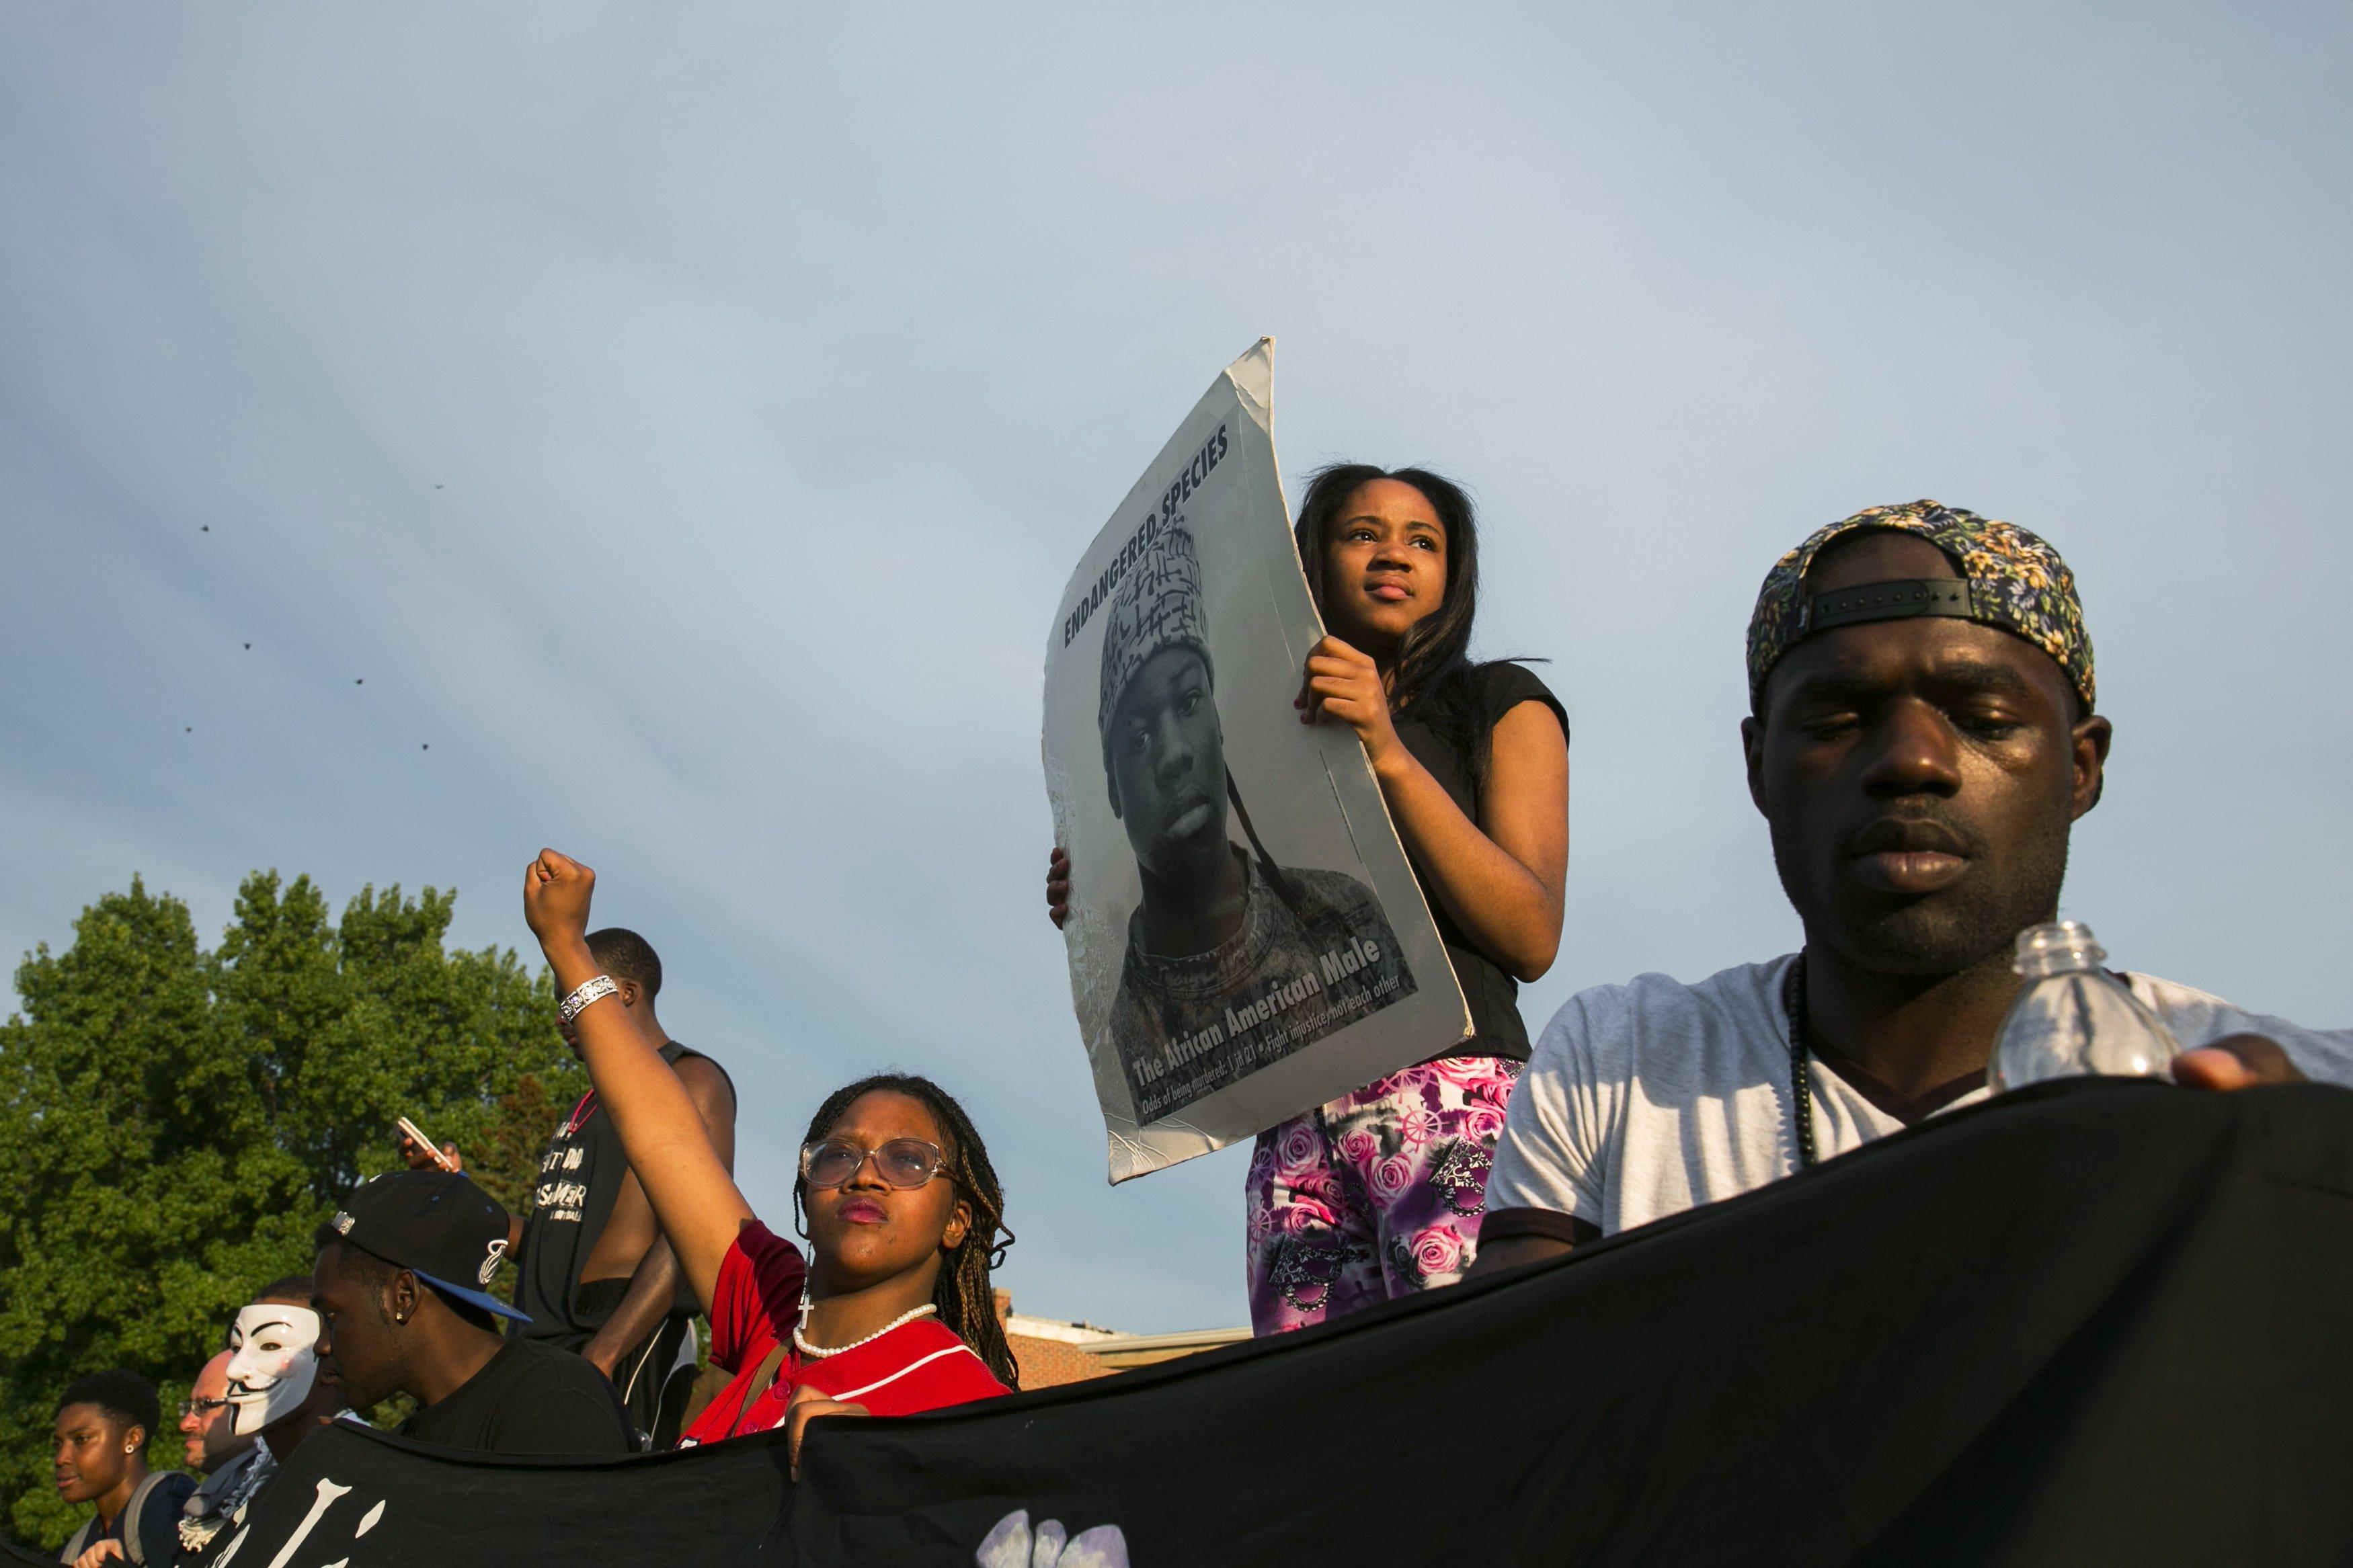 Demonstrators protest outside of Greater St. Marks Family Church in Ferguson, Mo. on Aug. 14, 2014.